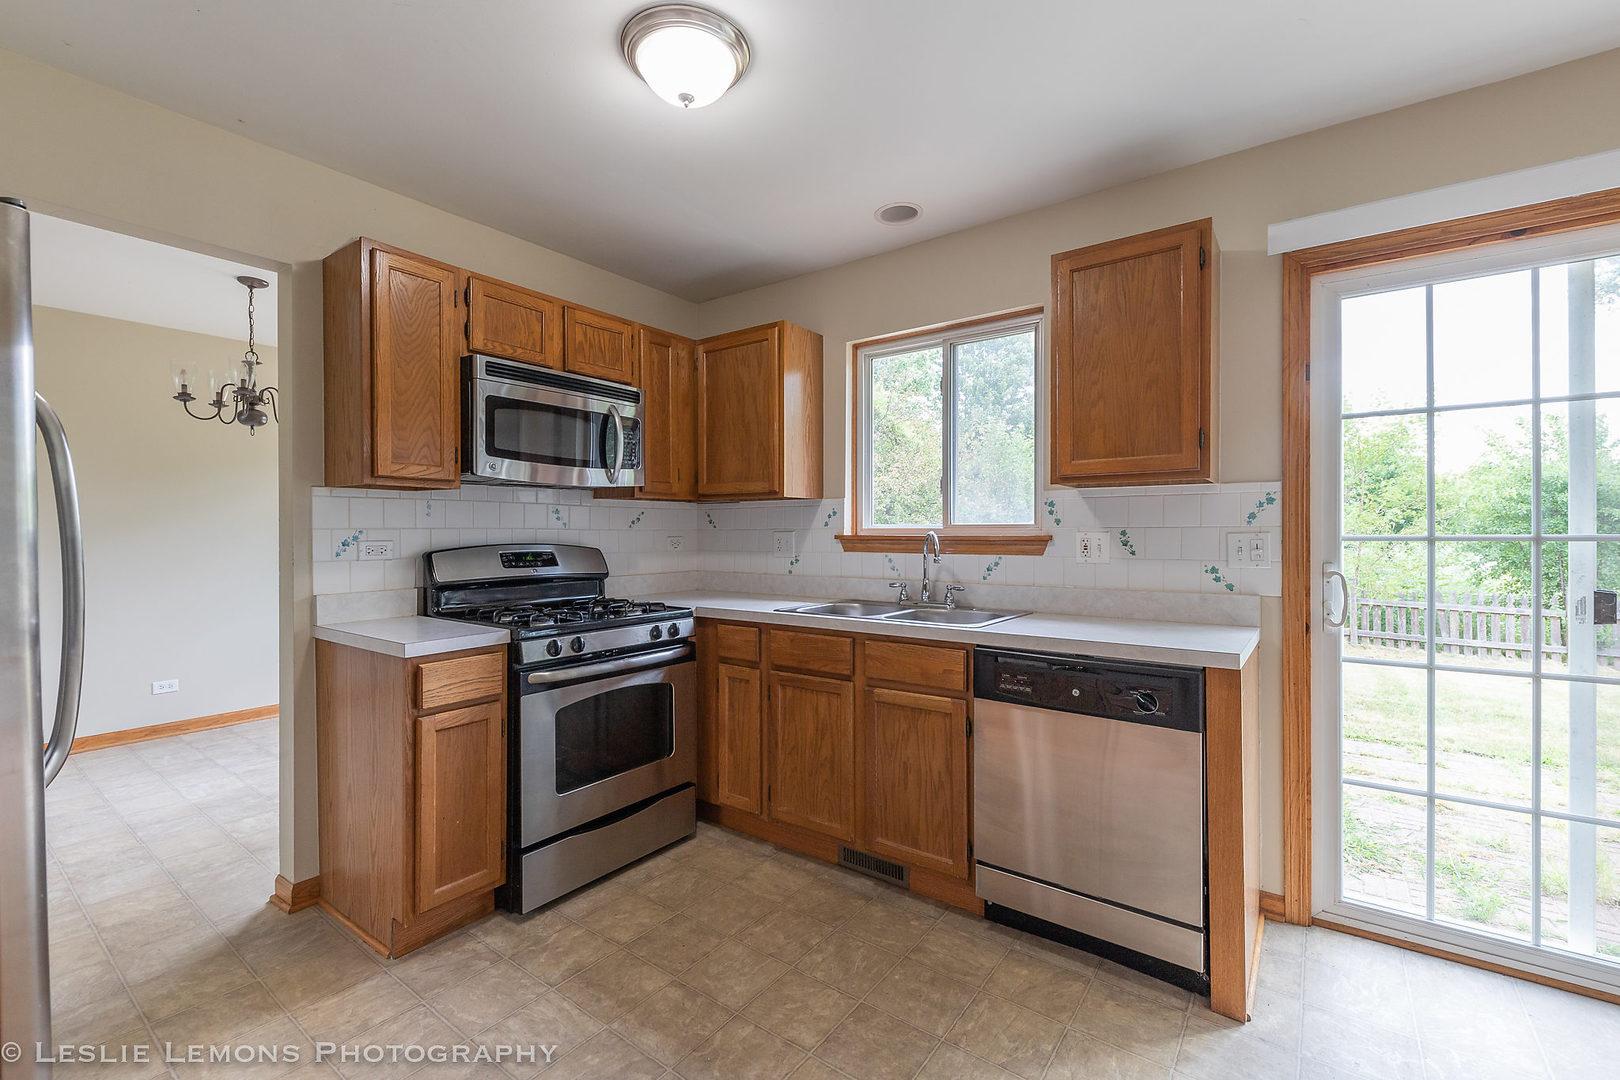 2335 Woodoak, ROUND LAKE BEACH, Illinois, 60073